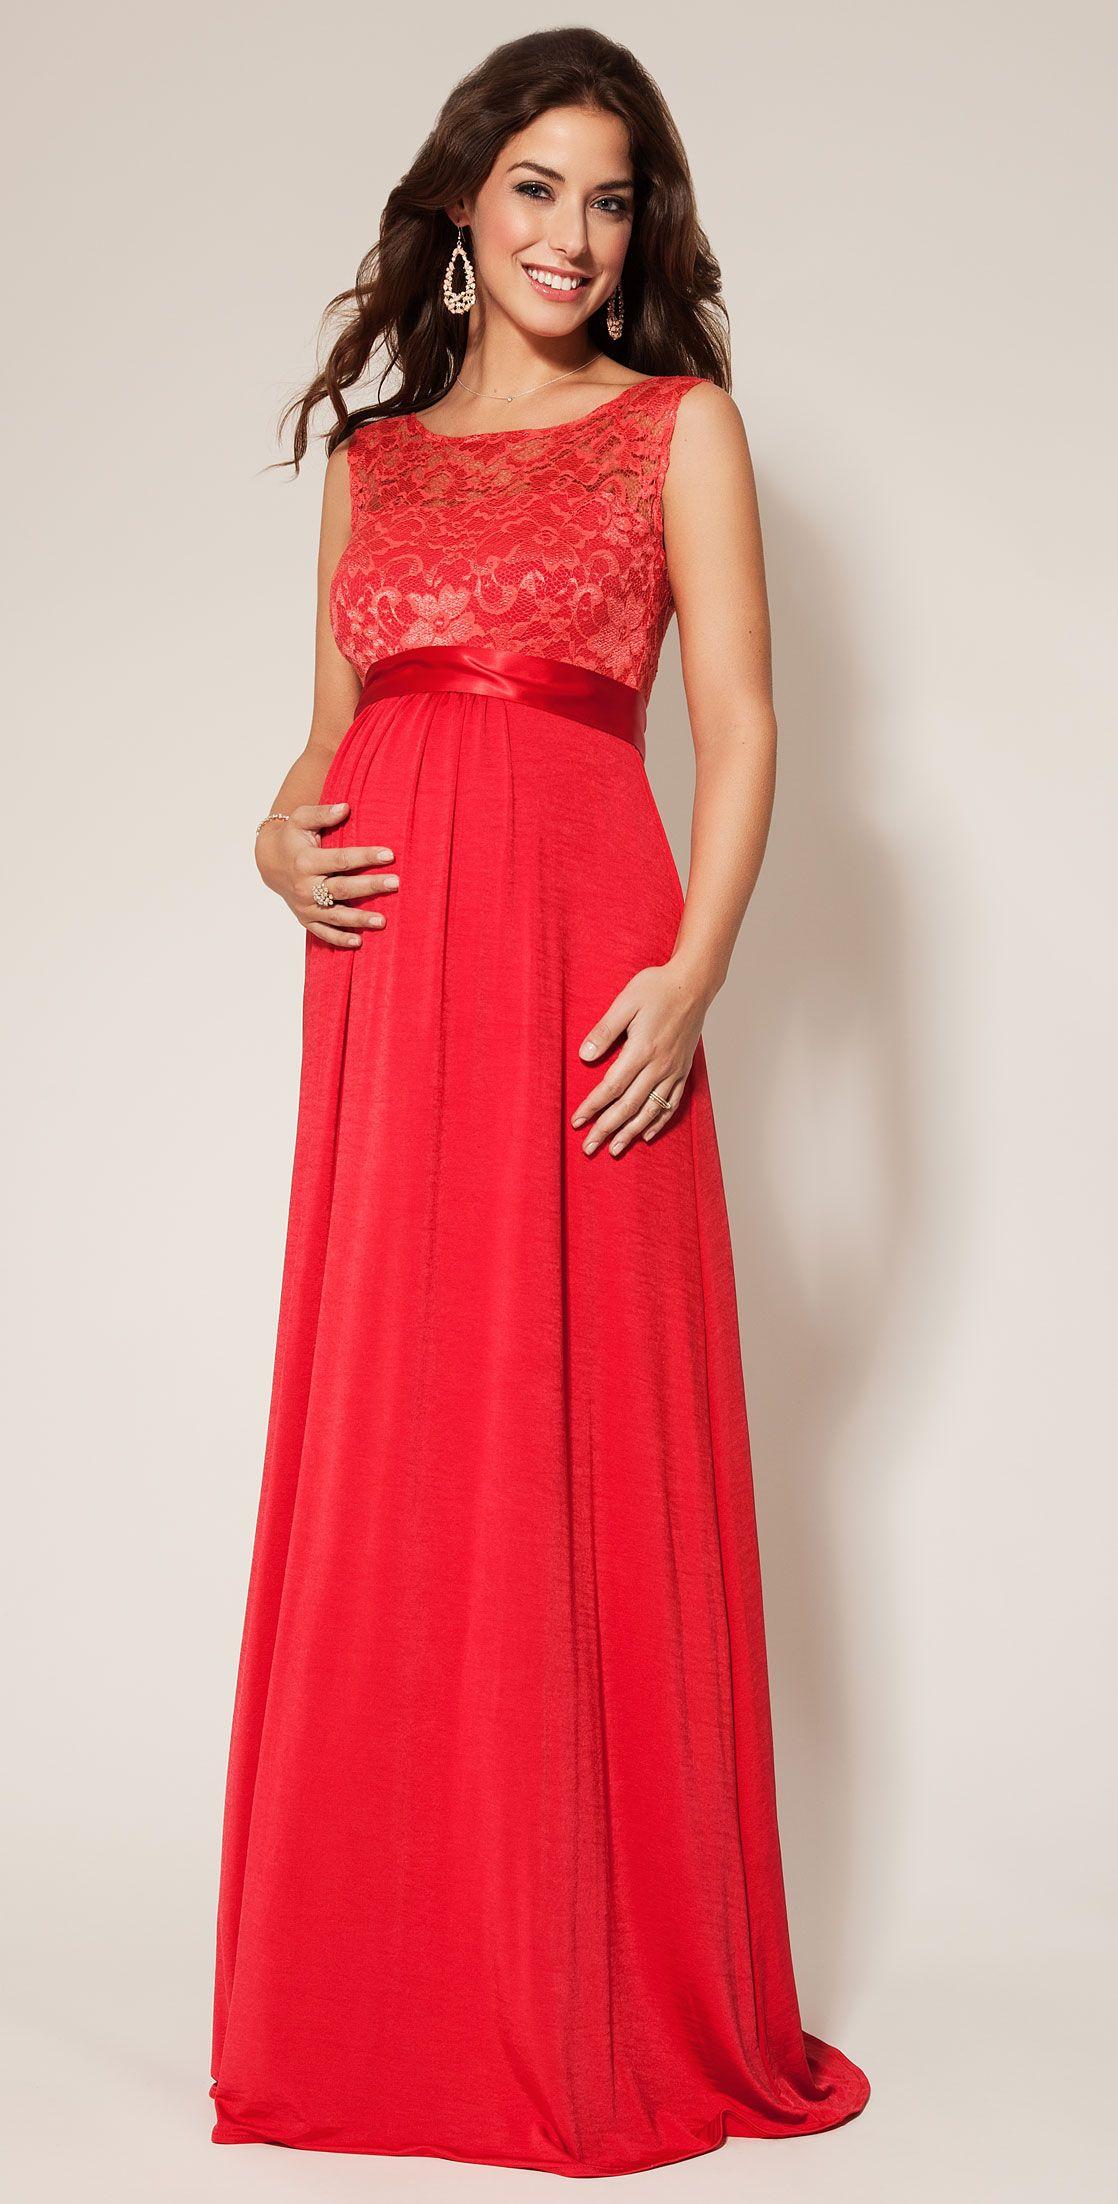 maternity dresses for wedding Valencia Gown Long Pregnant Bridesmaid DressesMaternity Wedding